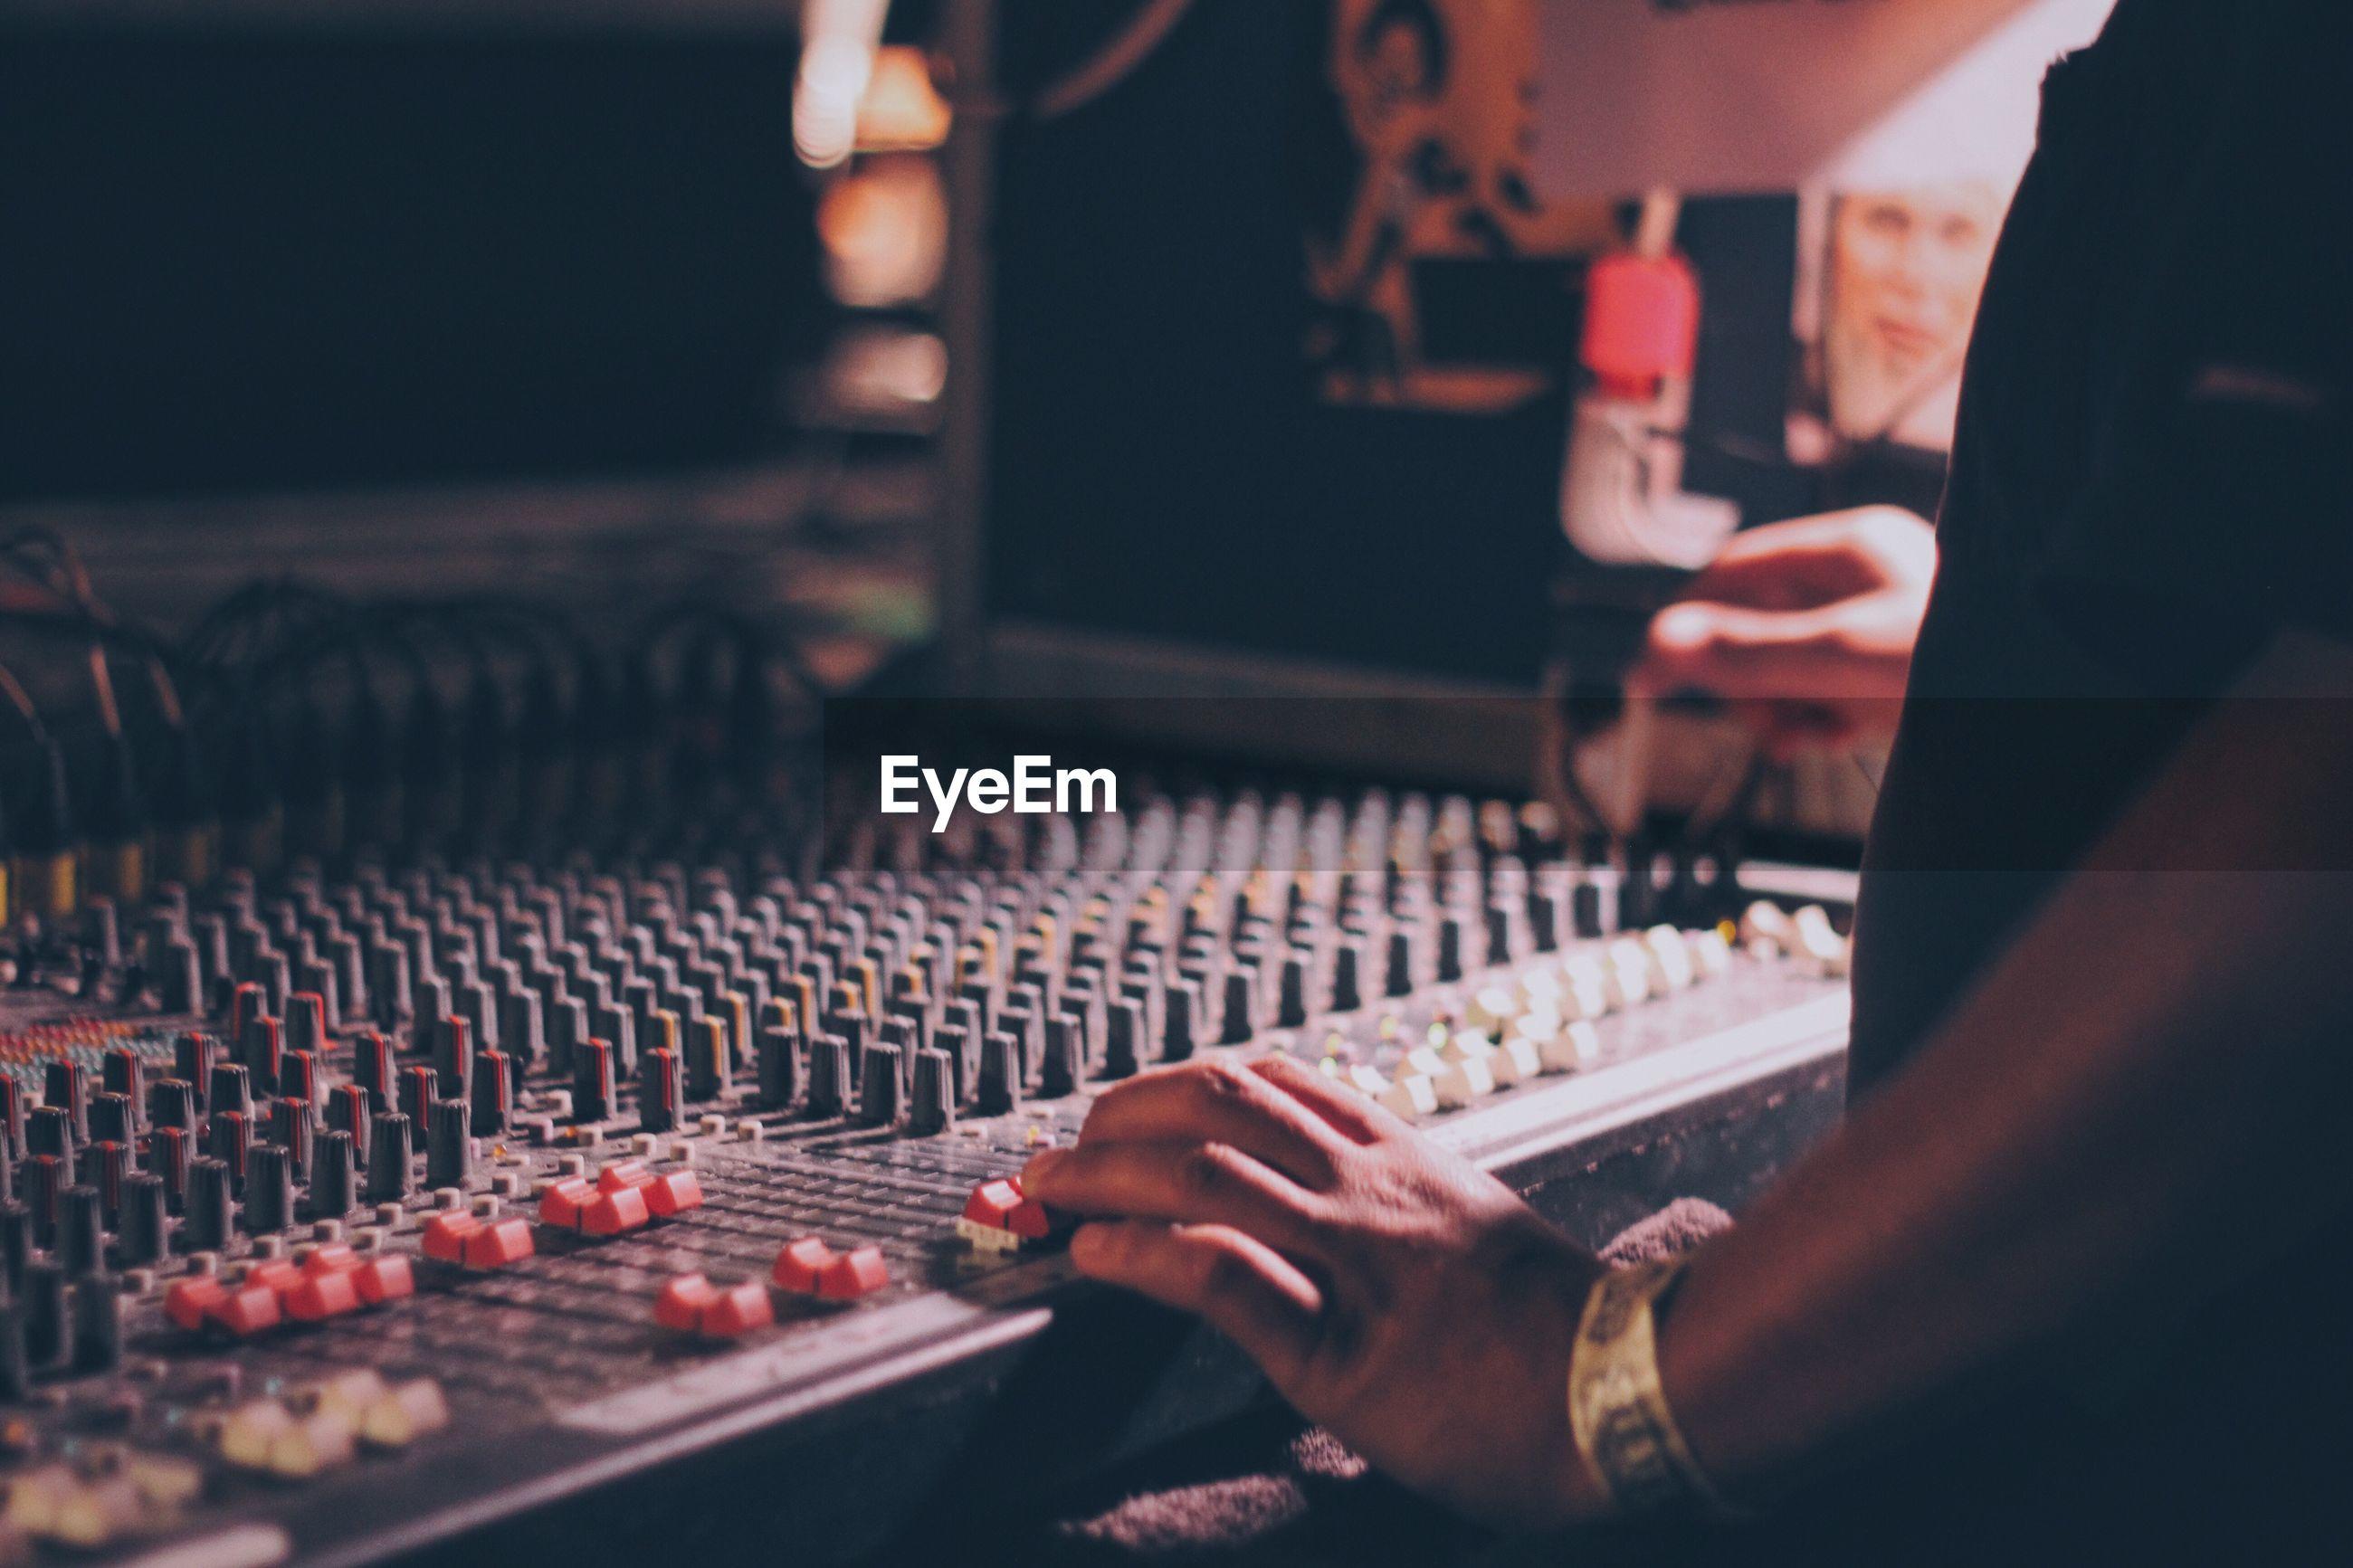 Close-up of hand using sound mixer